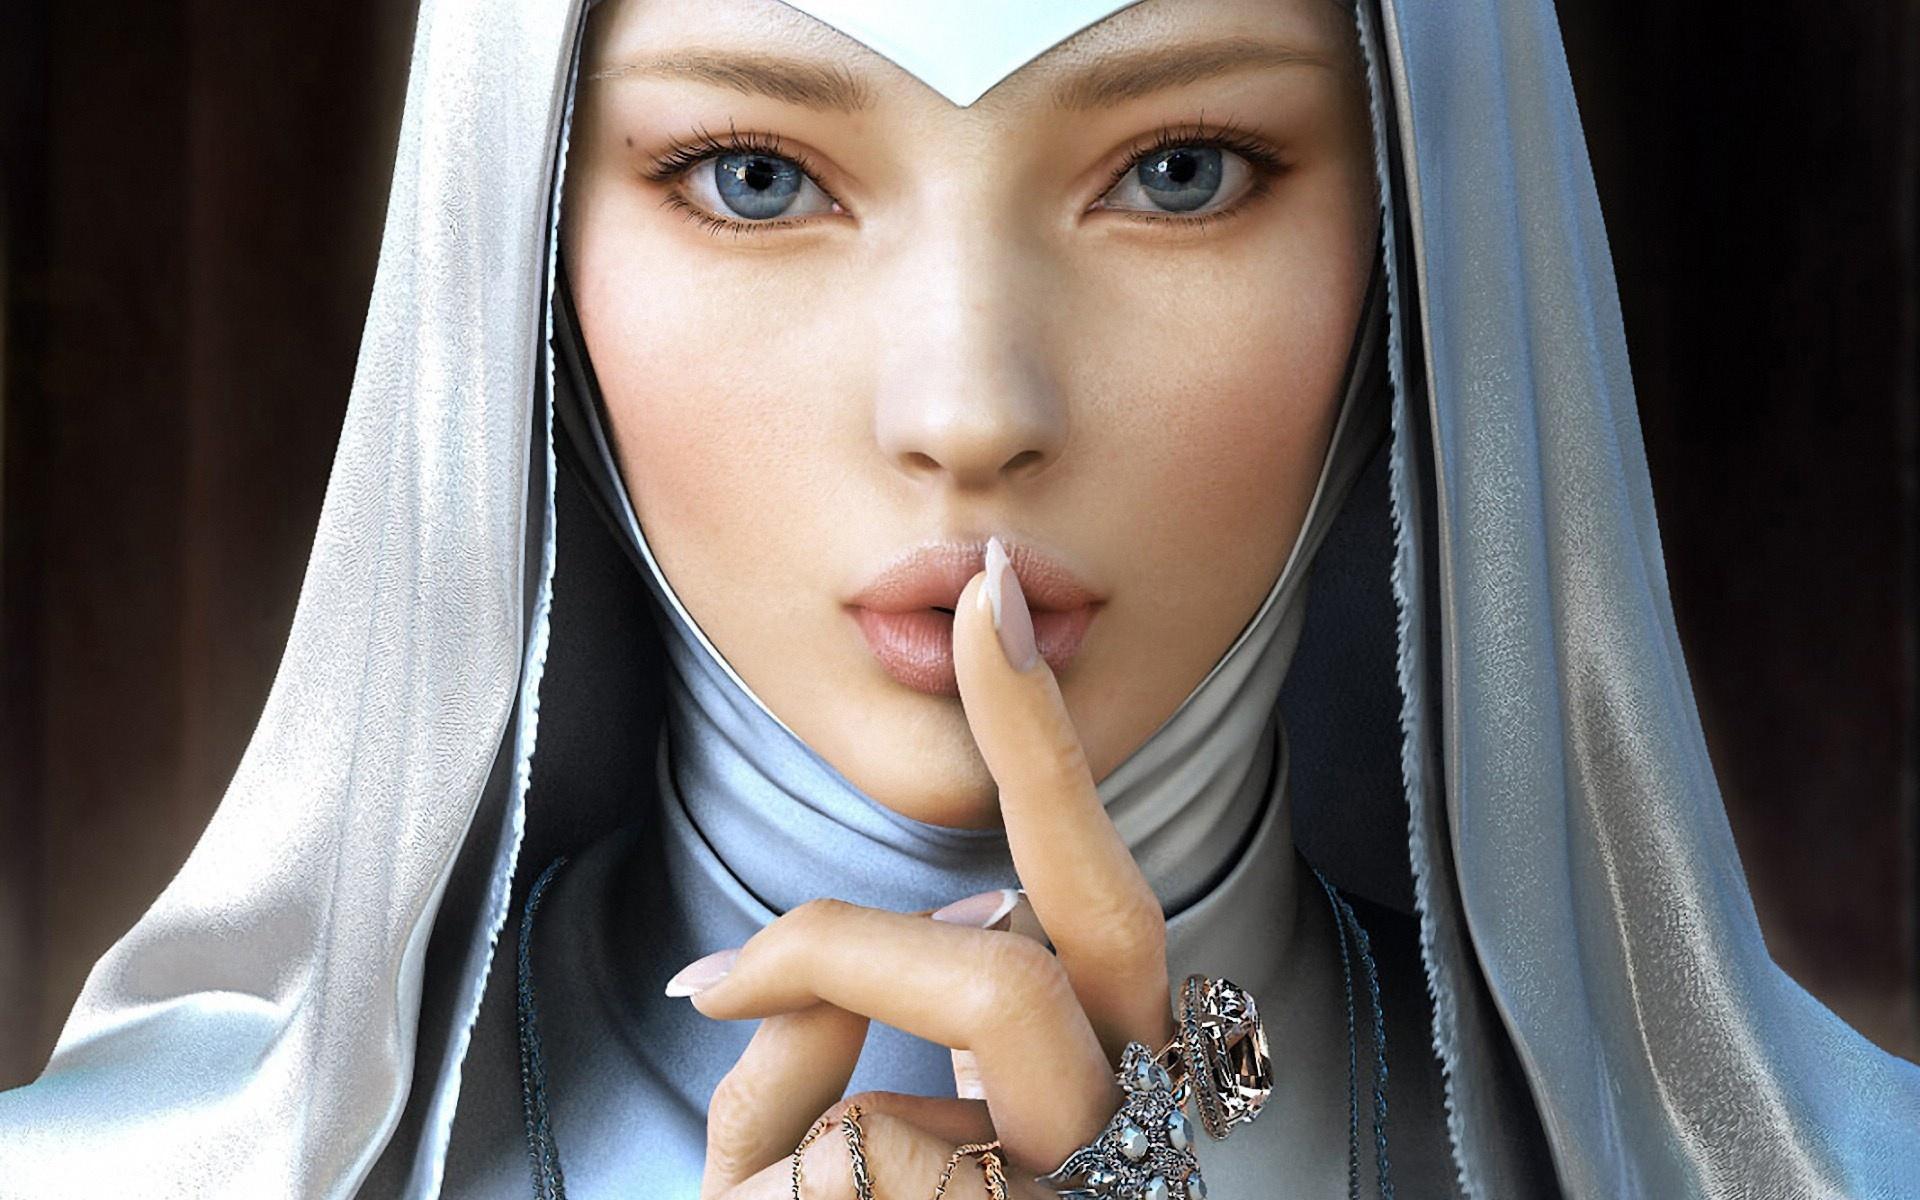 Catholic Fantasy Art Women HD Wallpaper 1920x1200